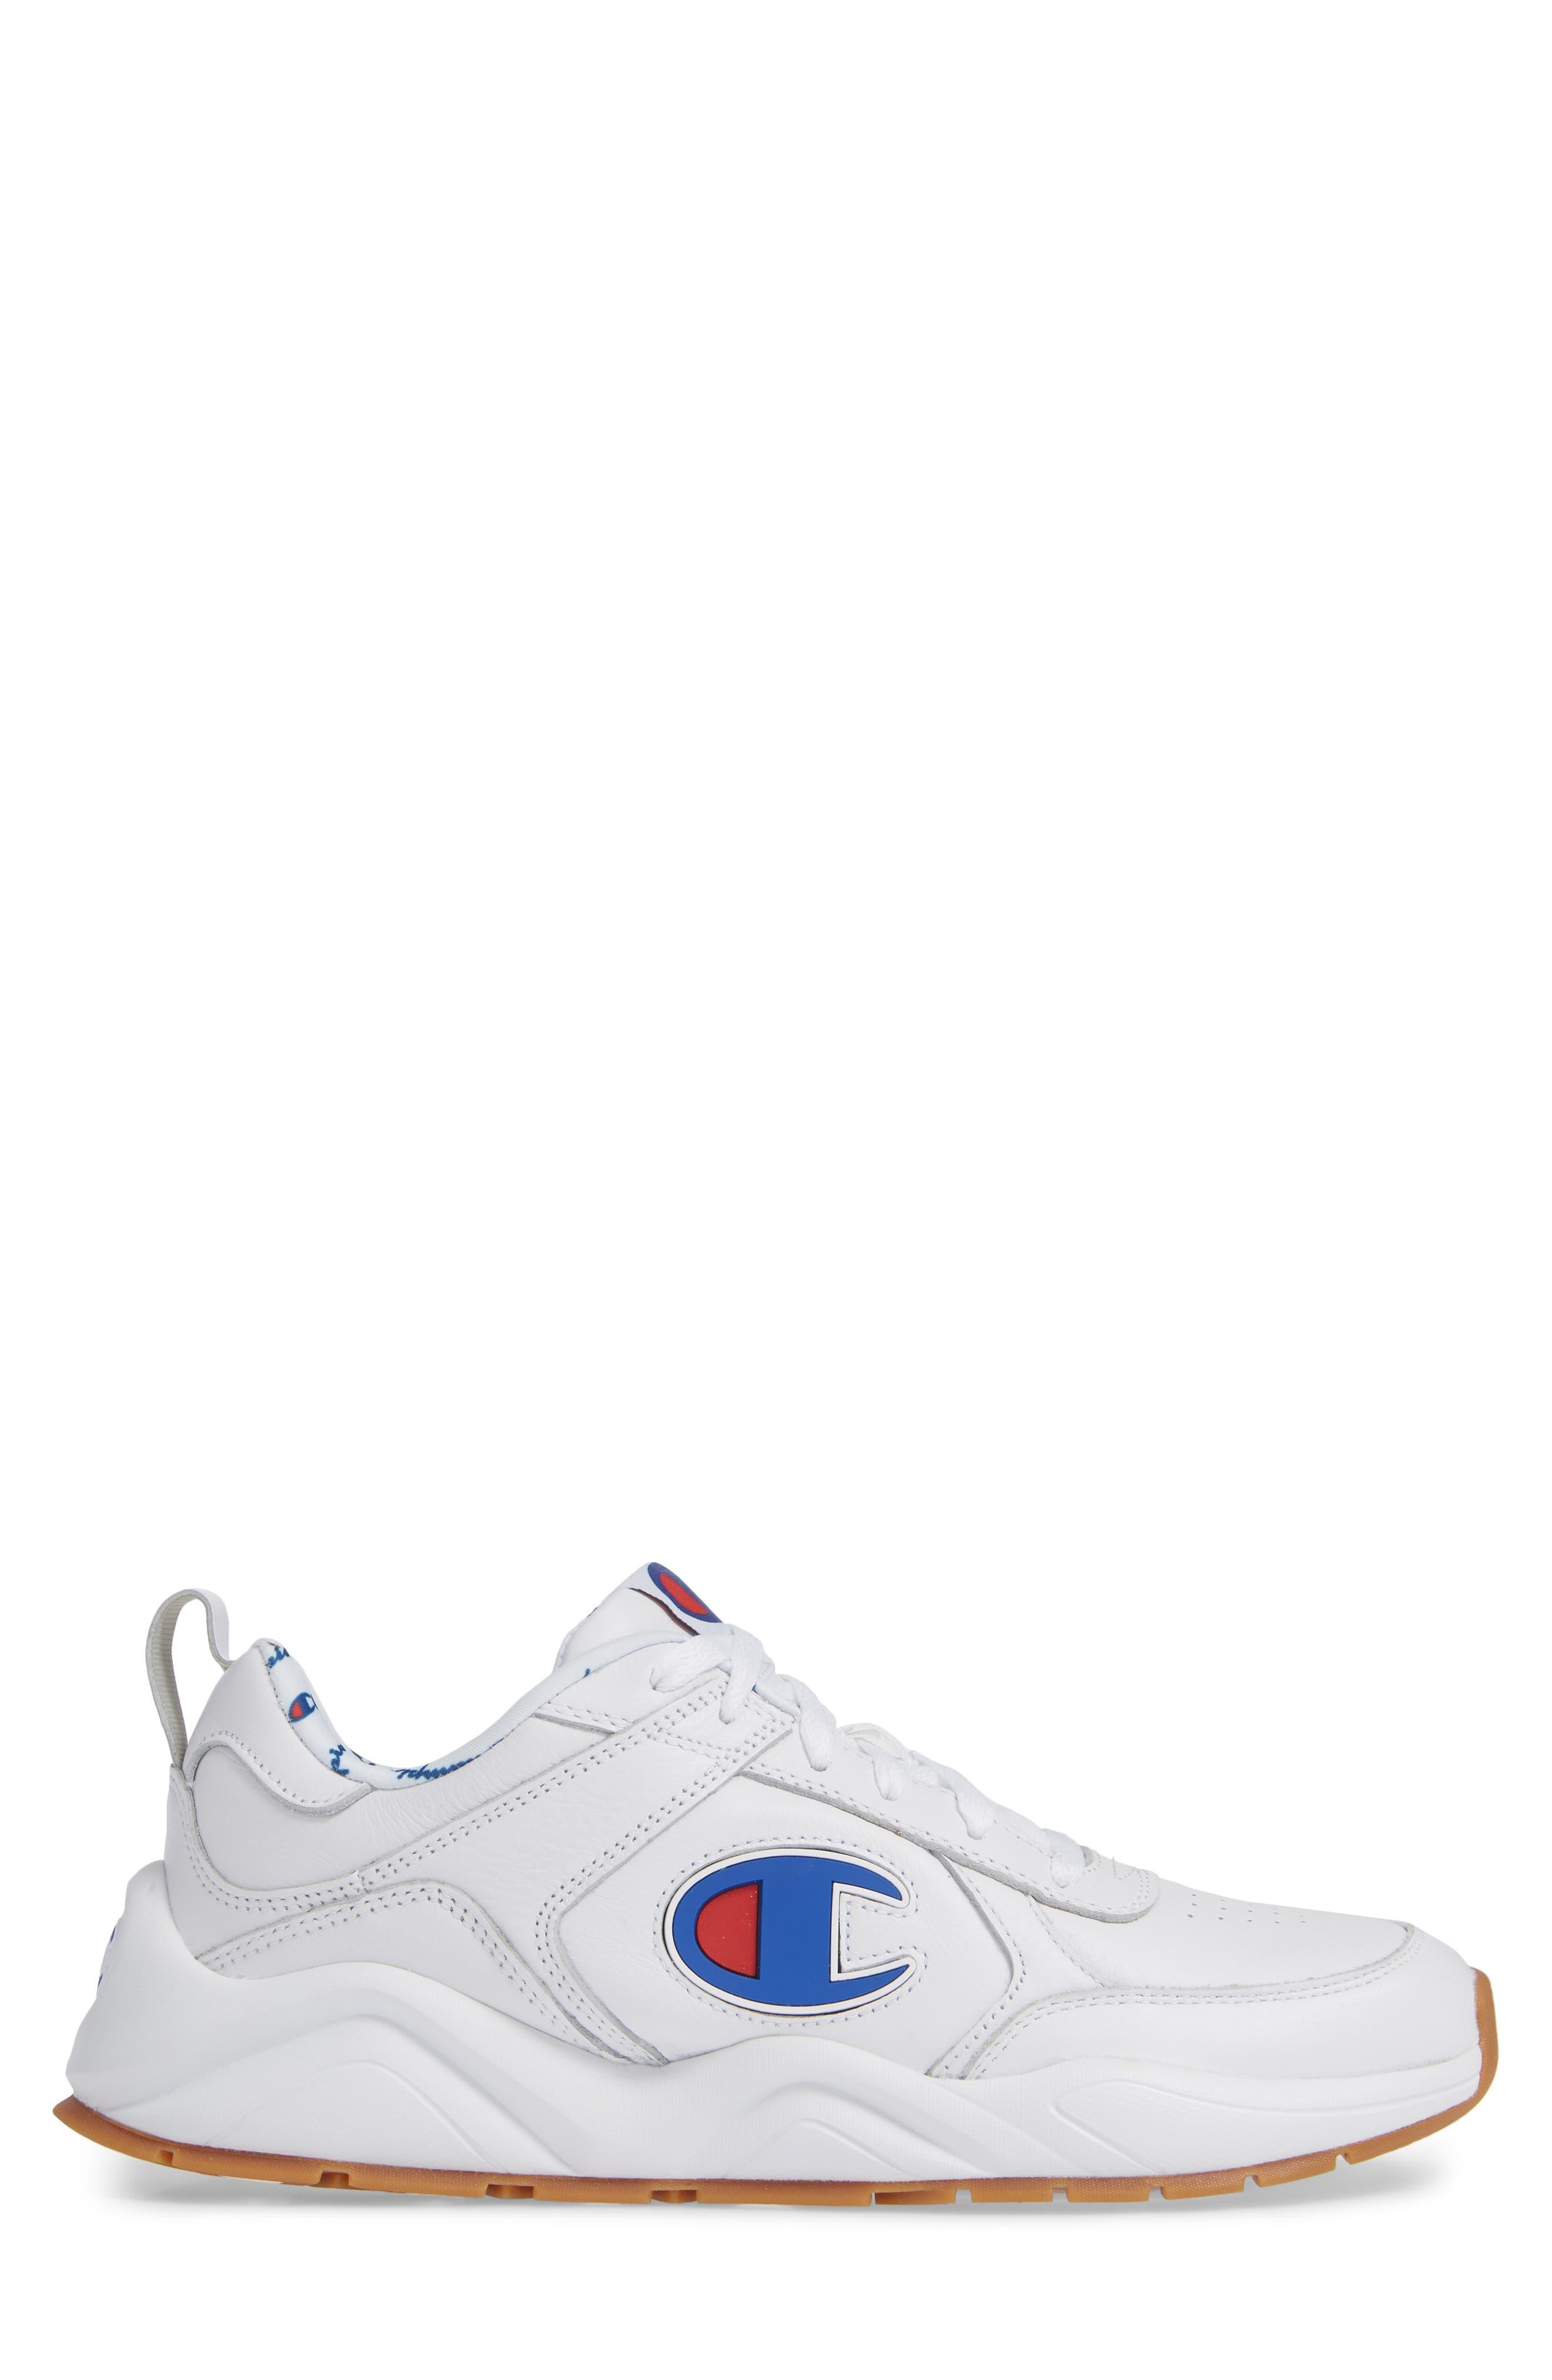 Bones Big-C Sneaker,                             Alternate thumbnail 3, color,                             WHITE